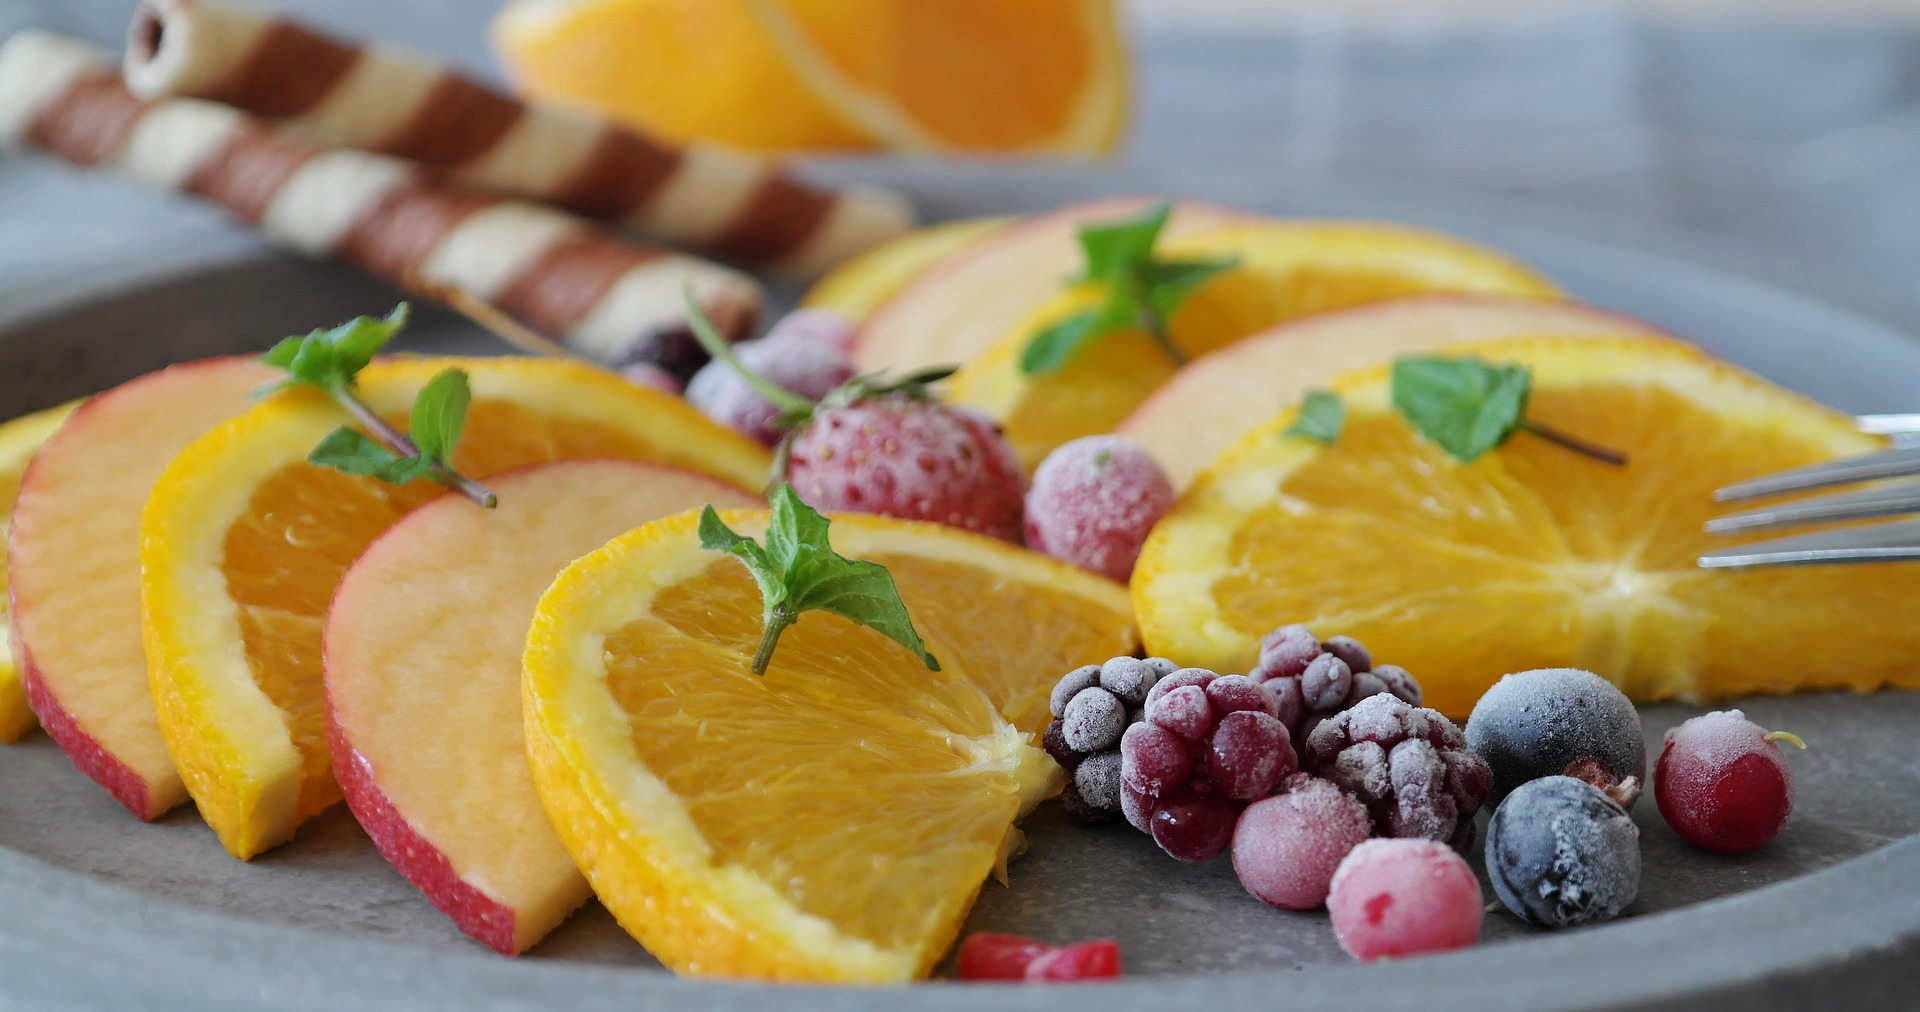 fruit-3661159_1920